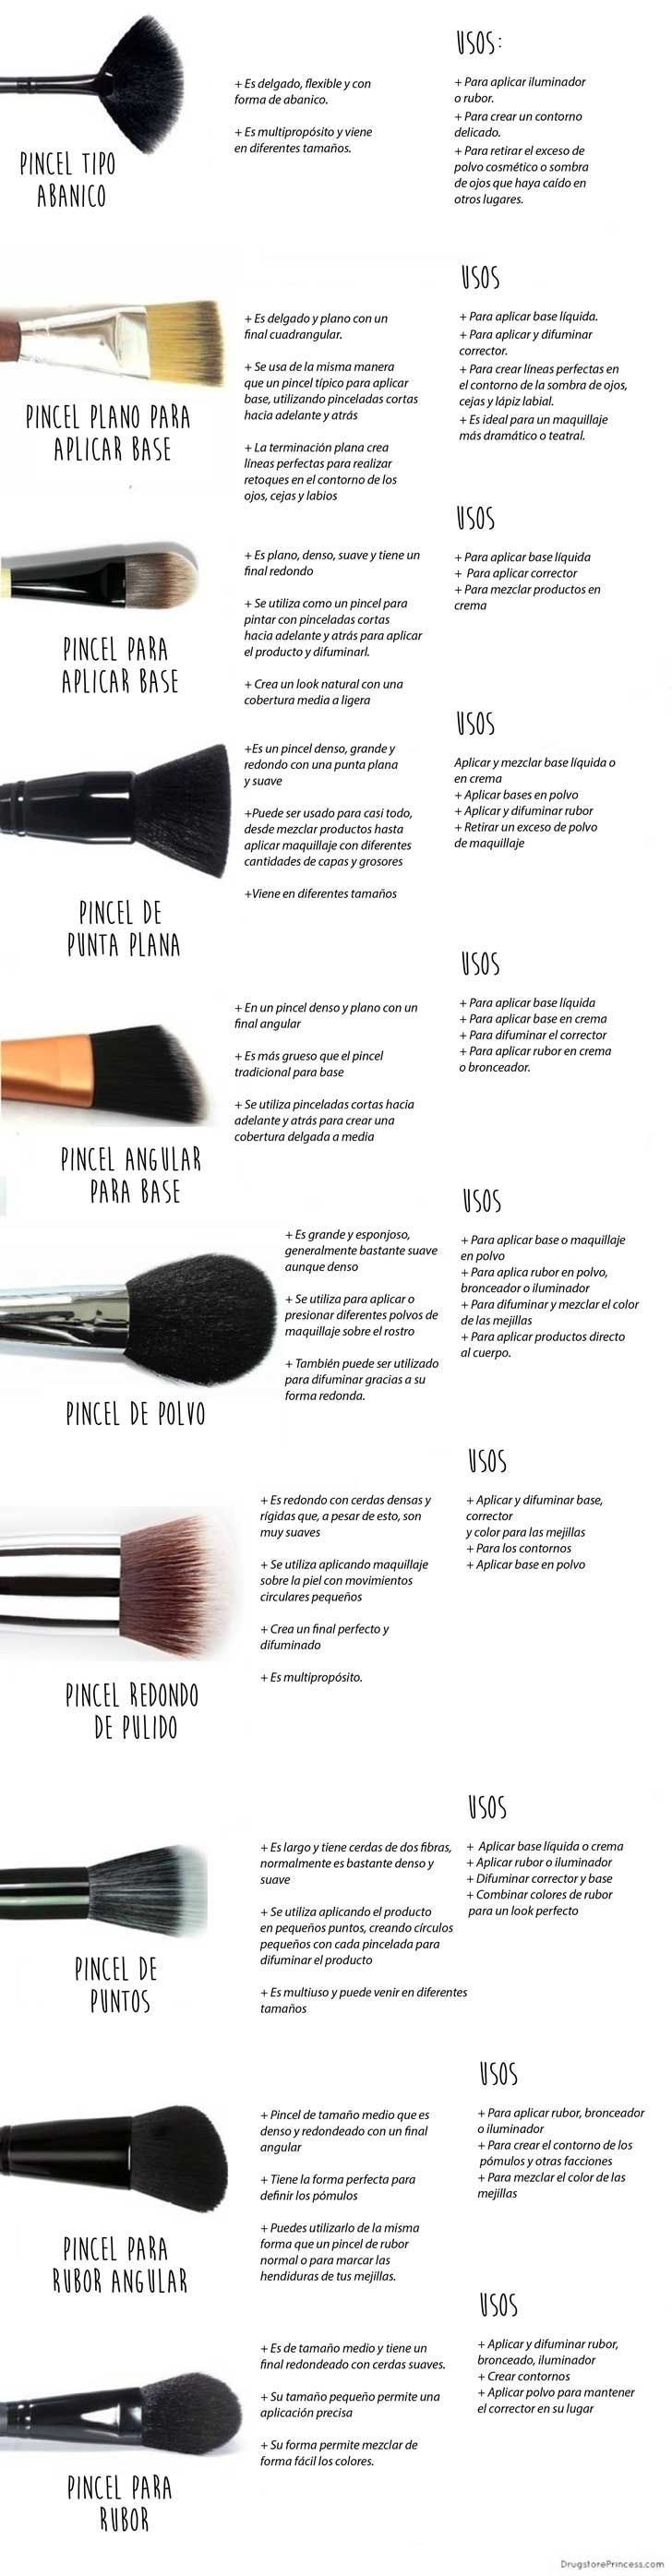 102d46cf1b109f5e587e09e134d3279b - maquillaje mejores equipos